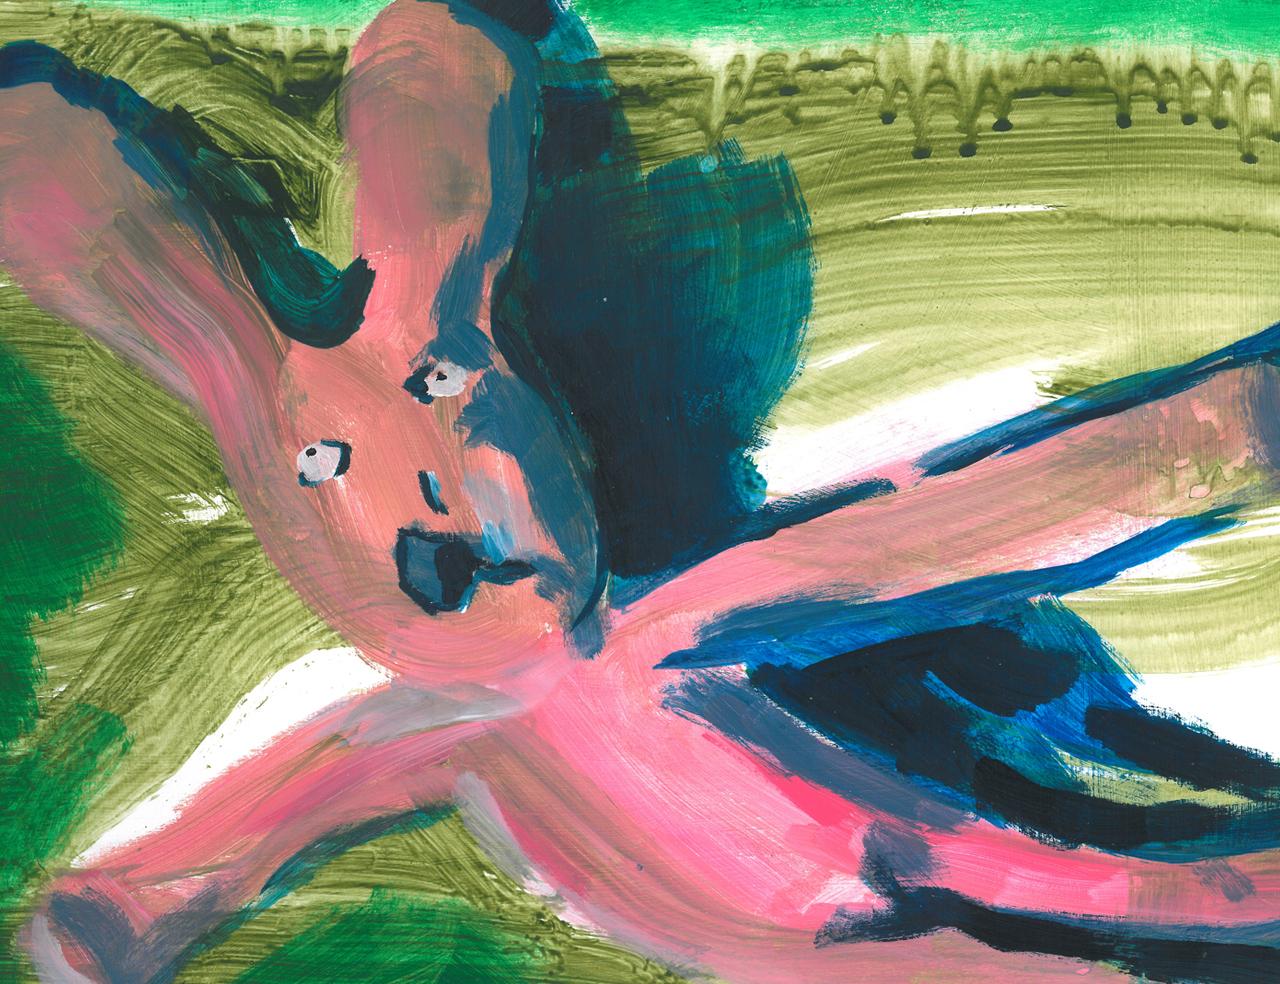 Hare left lying   Acrylic on Paper / 33x22 cm / 2015